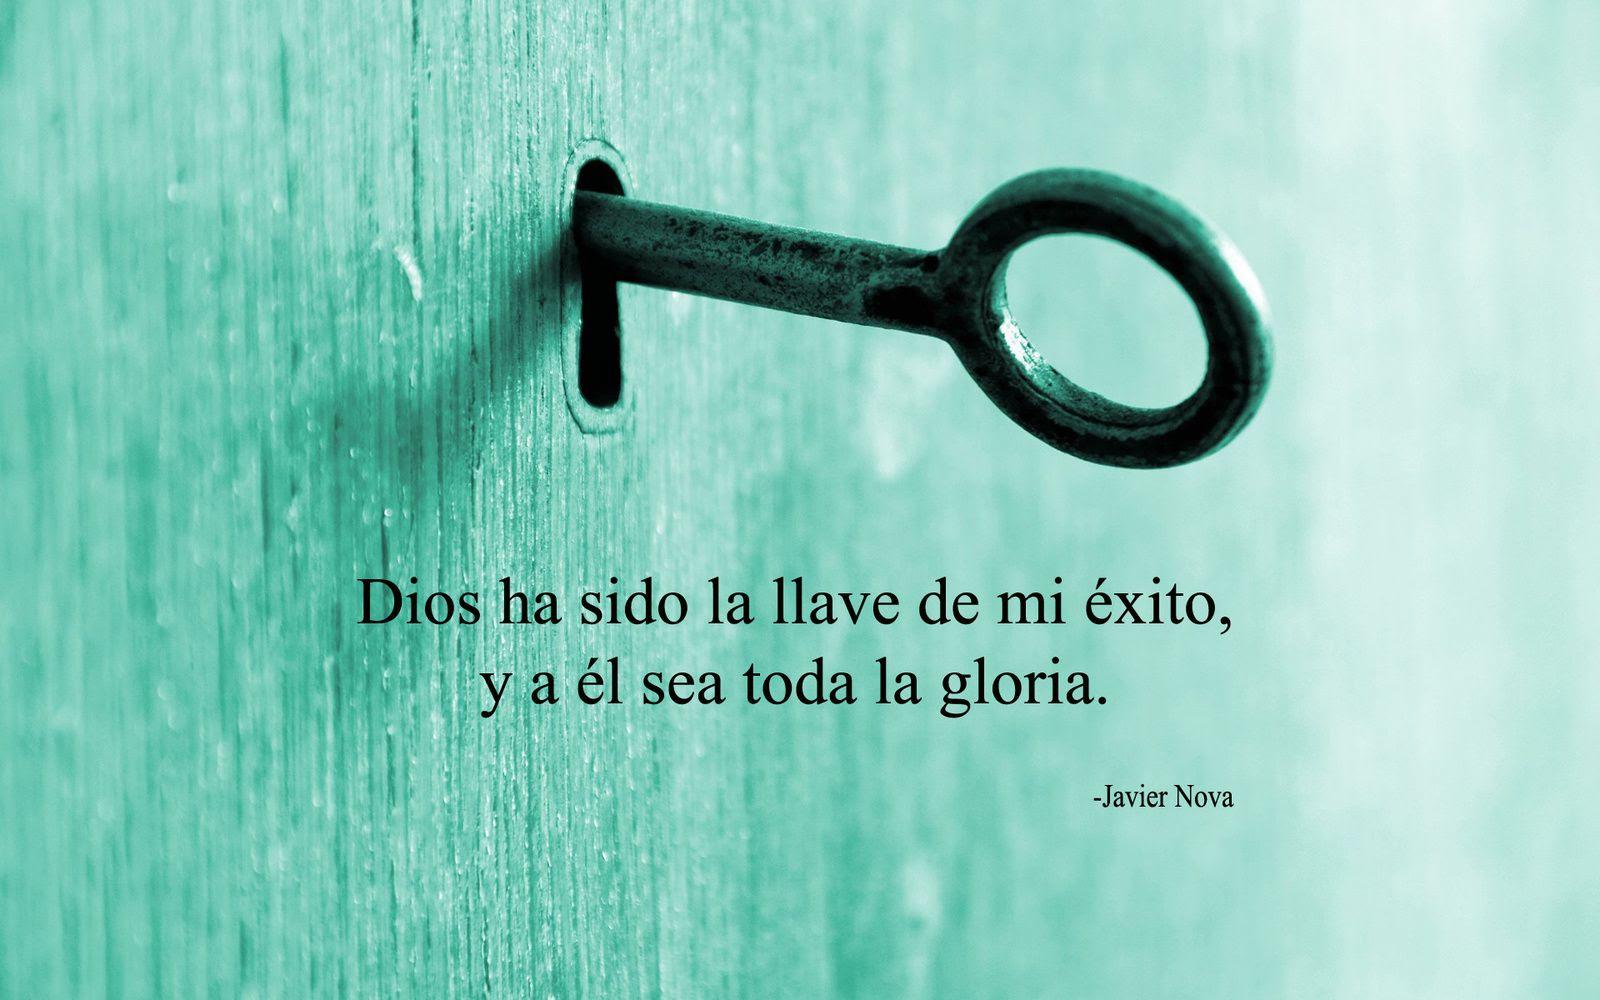 Luis Javier Nova Frases Cristianas Para Jovenes Mensajes Cristianos